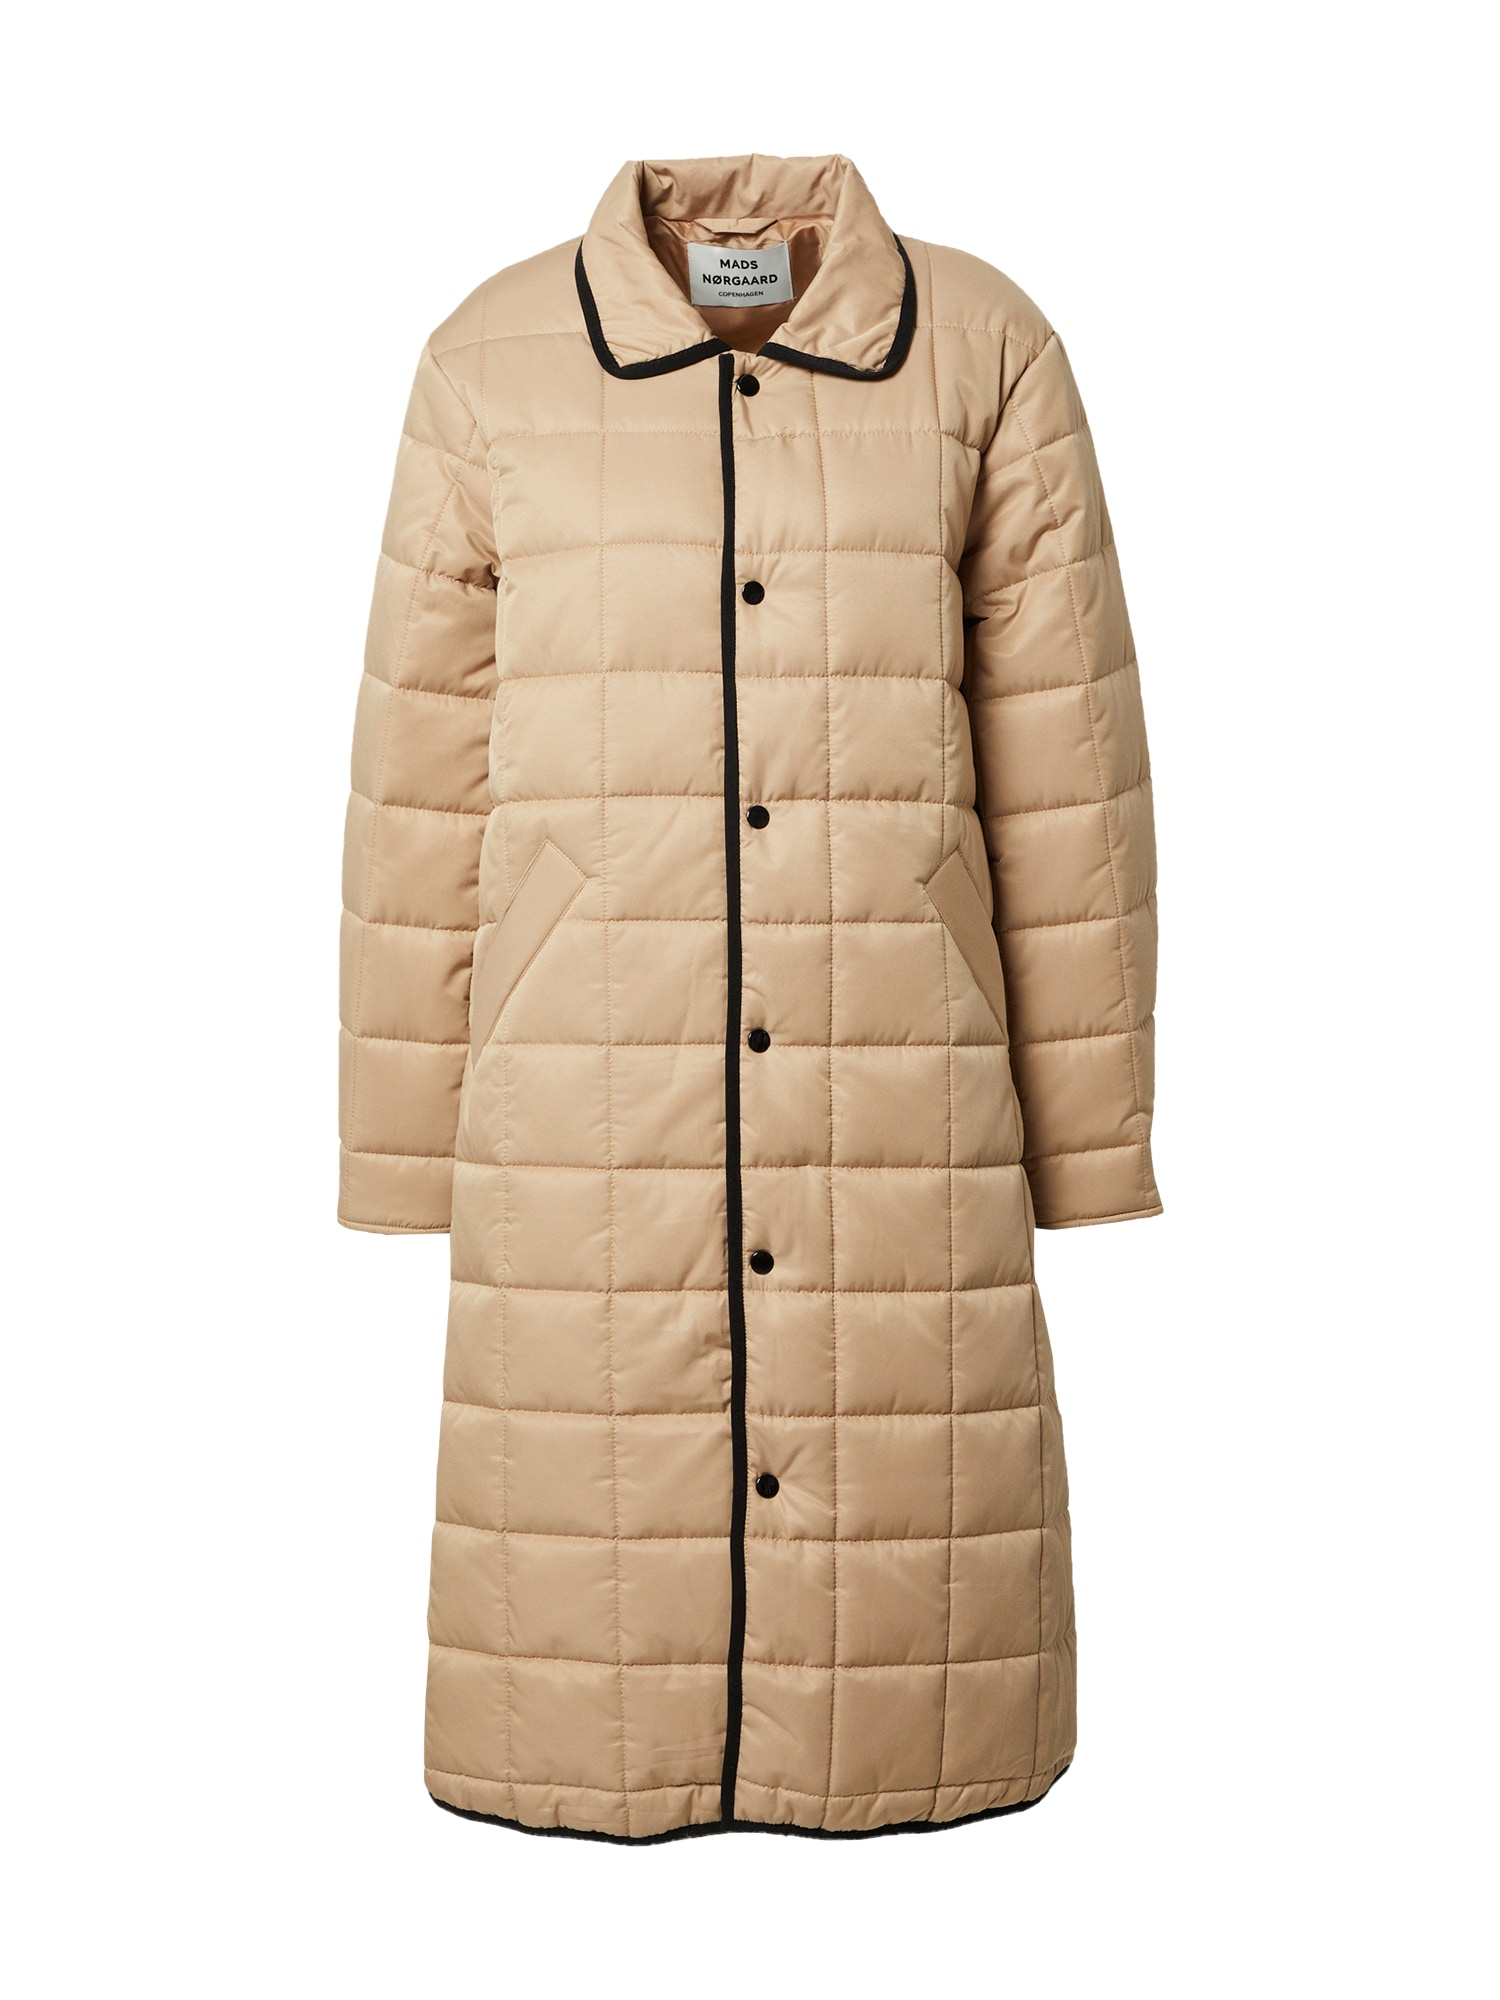 MADS NORGAARD COPENHAGEN Demisezoninis paltas